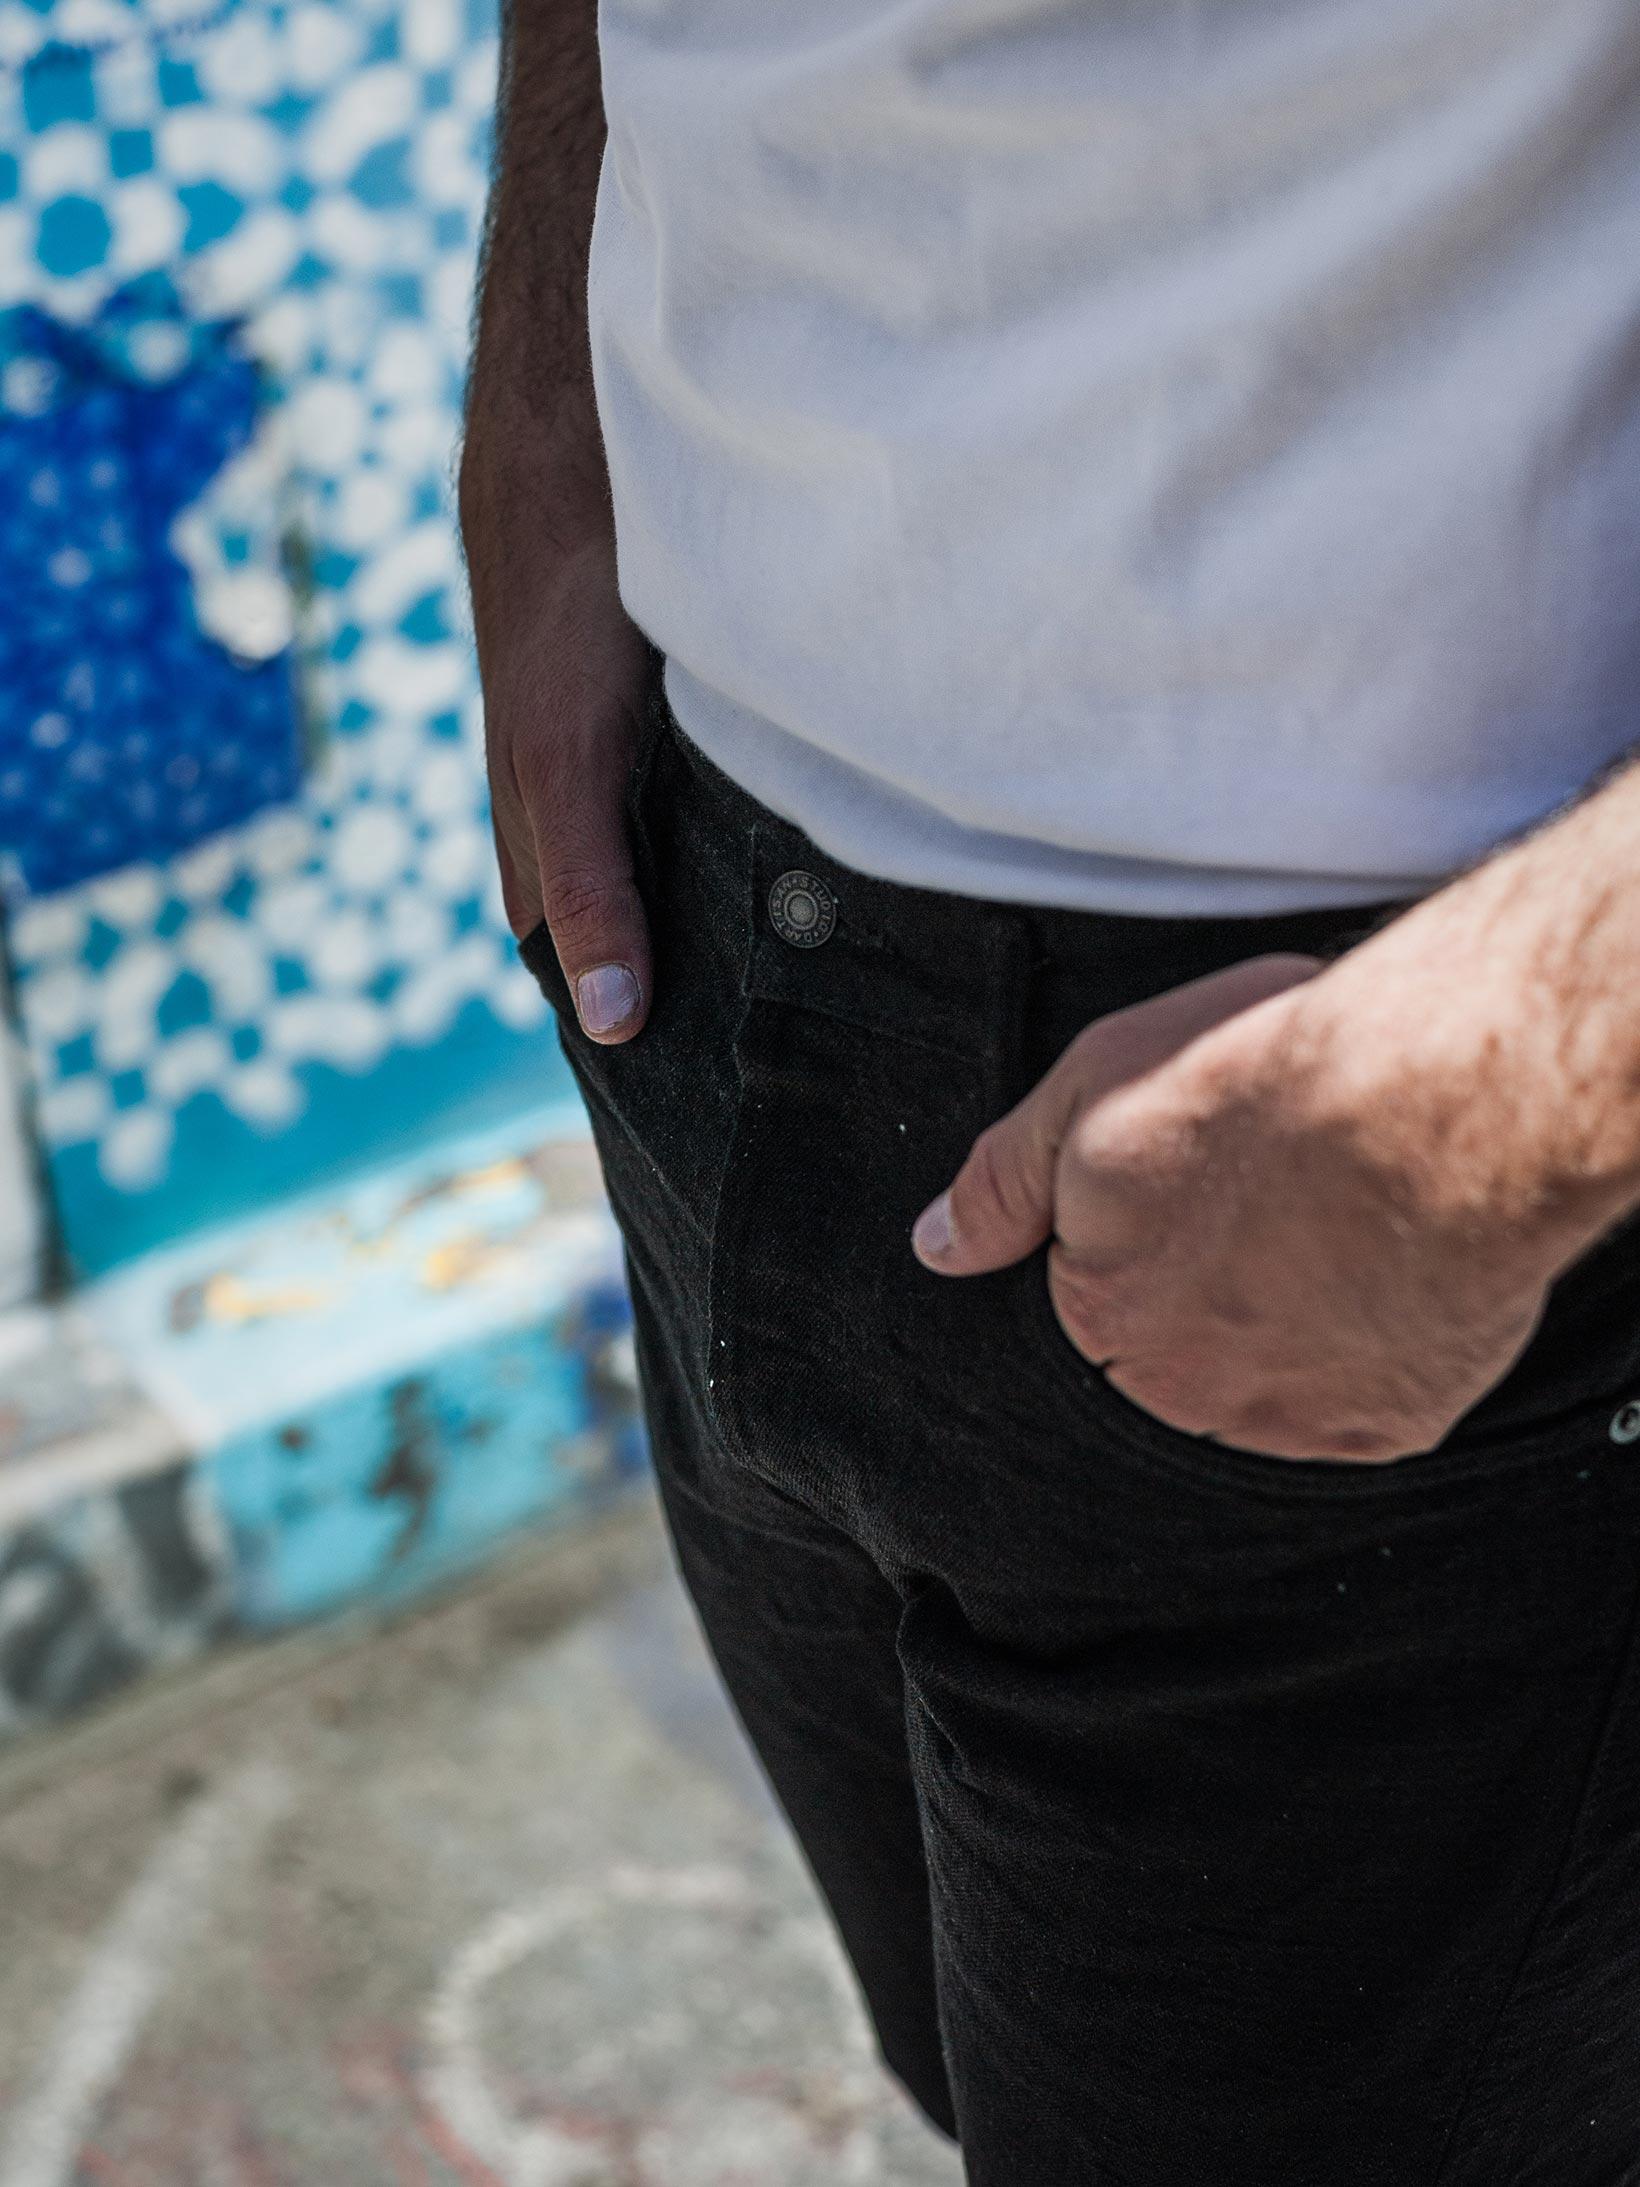 Studio D'Artisan SE-001 G3 Jeans - Straight Tapered Black - Image 28